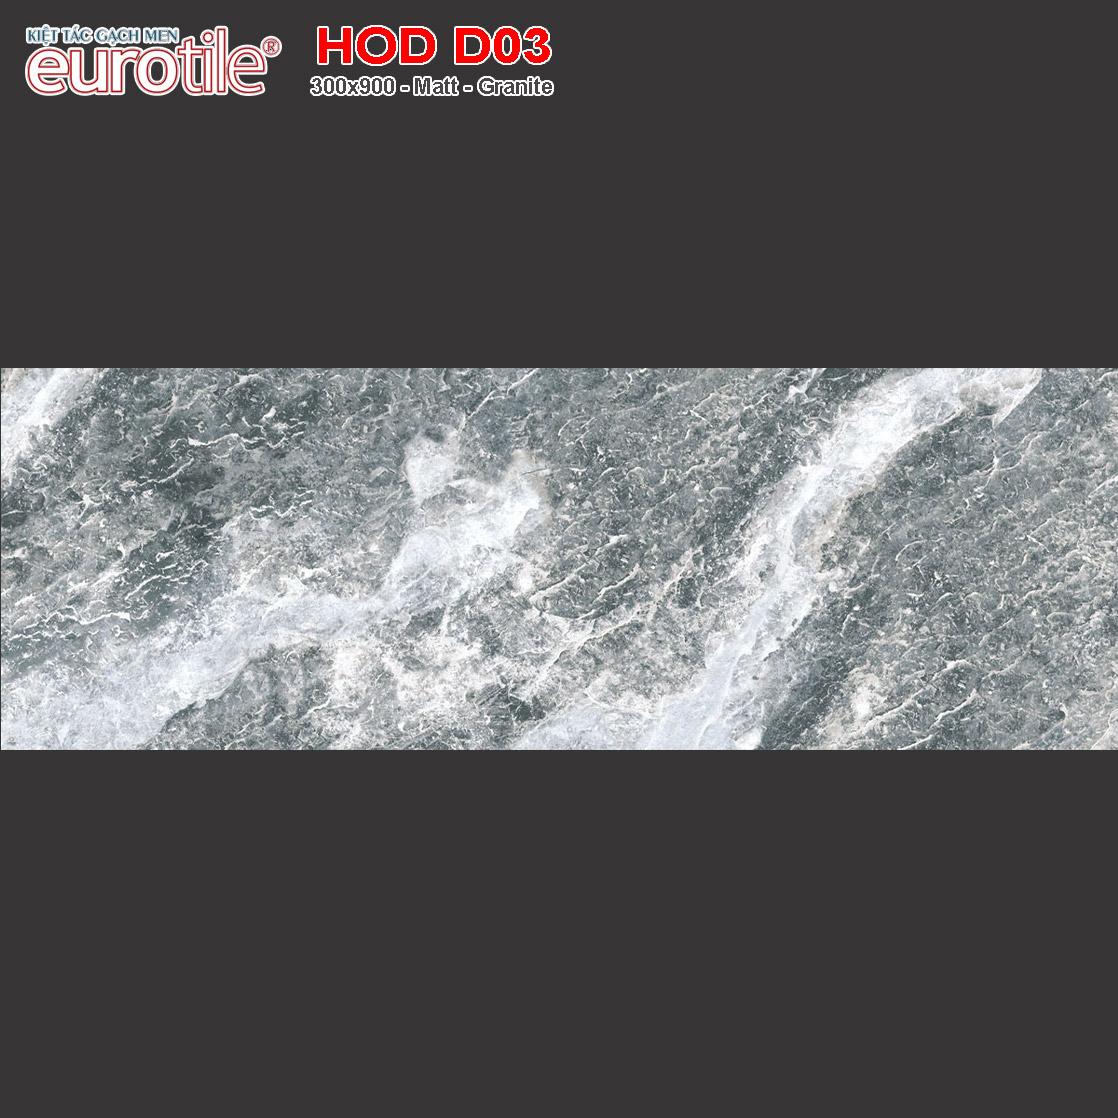 Gạch ốp lát 300x900 Eurotile Hoa Đá HOD D03 giá rẻ